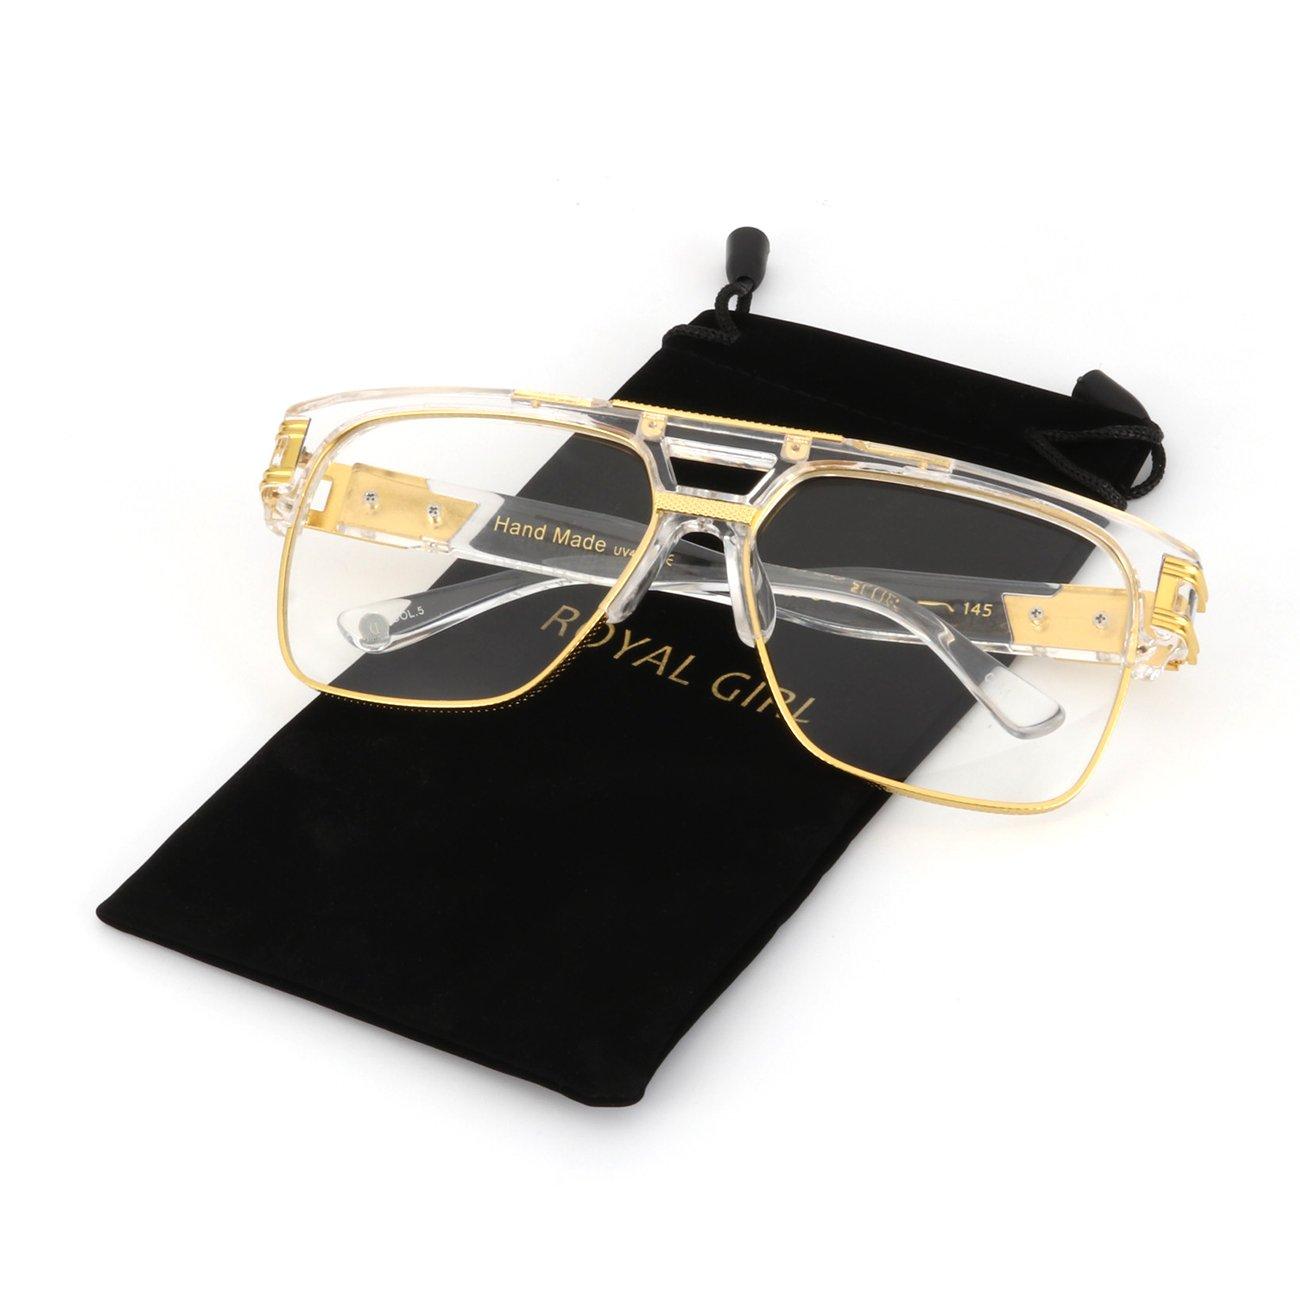 ROYAL GIRL Designer Sunglasses For Men Luxury Oversize Square Retro Classic Alloy Aviator Fashion Glasses (Clear Frame, 68)